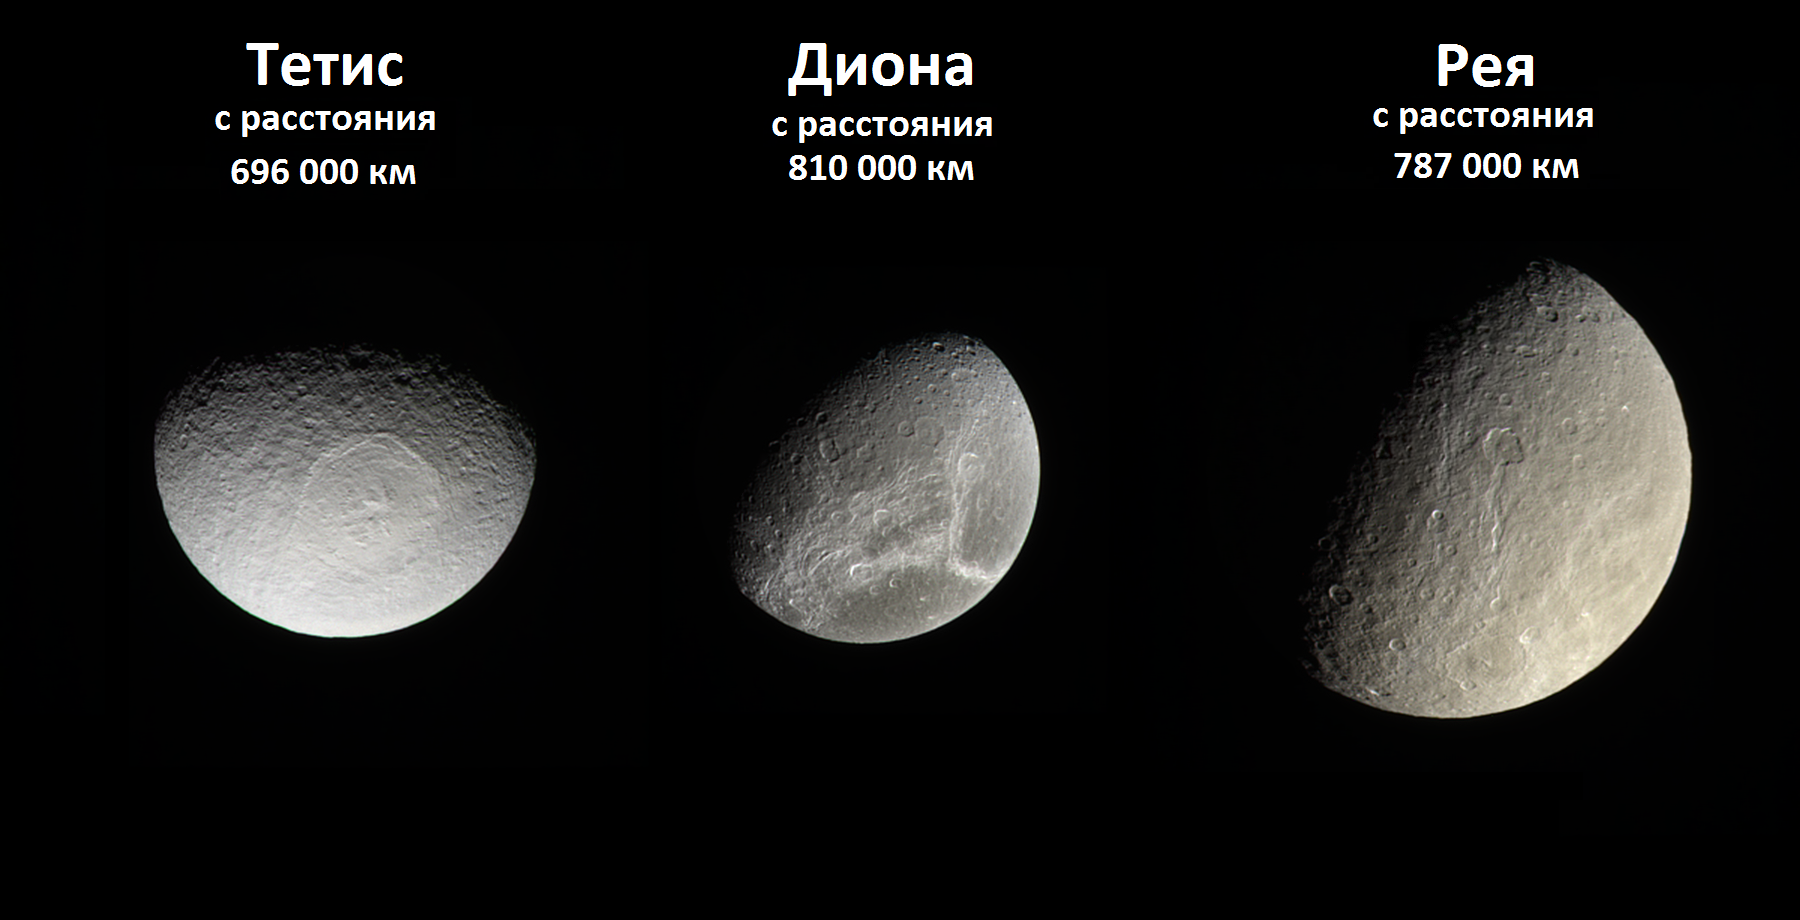 Сатурн — «Властелин колец» планета, сатурн, шестая